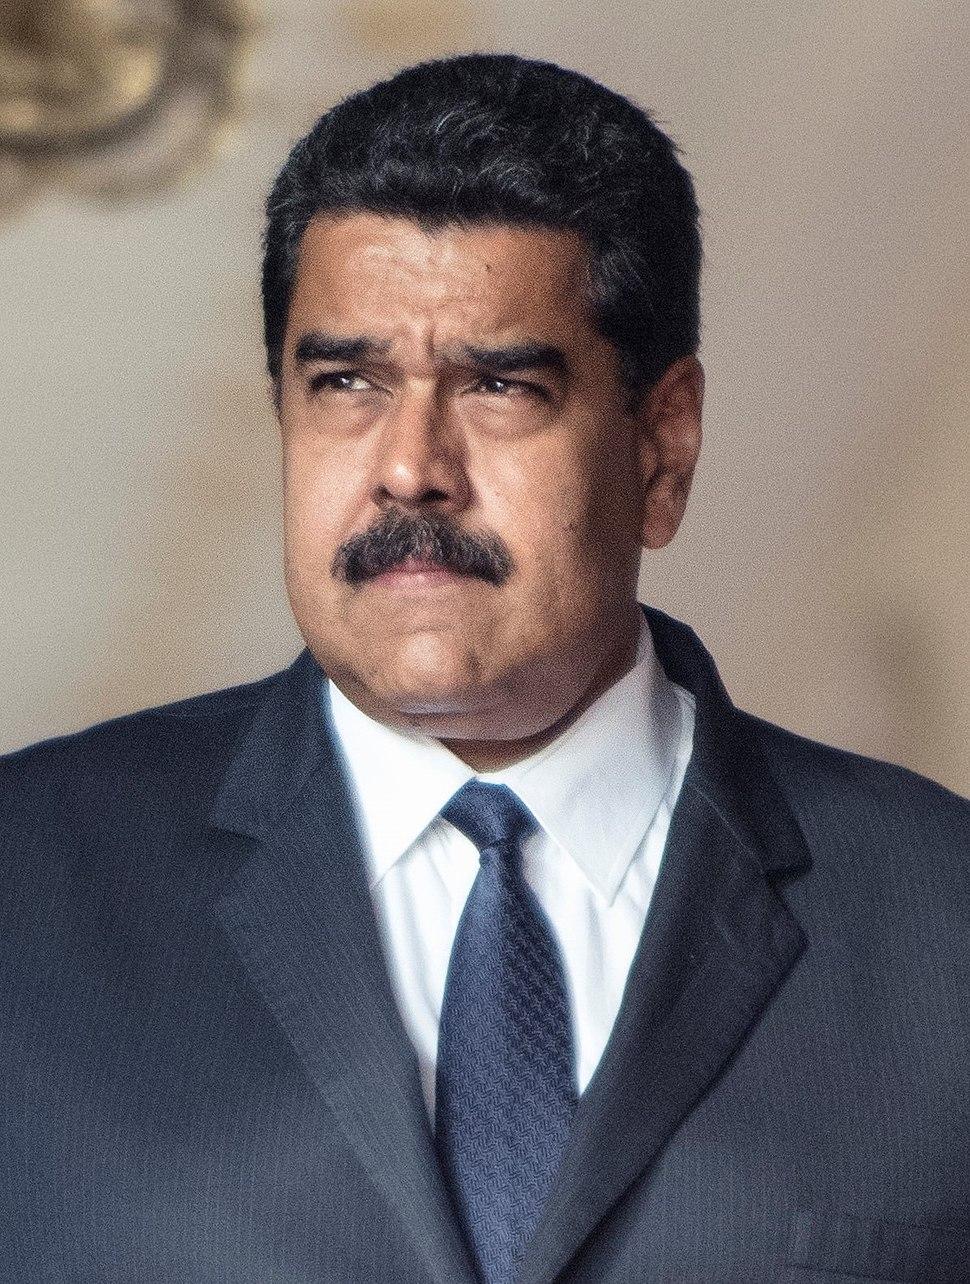 Nicolás Maduro, president of Venezuela (2016) cropped